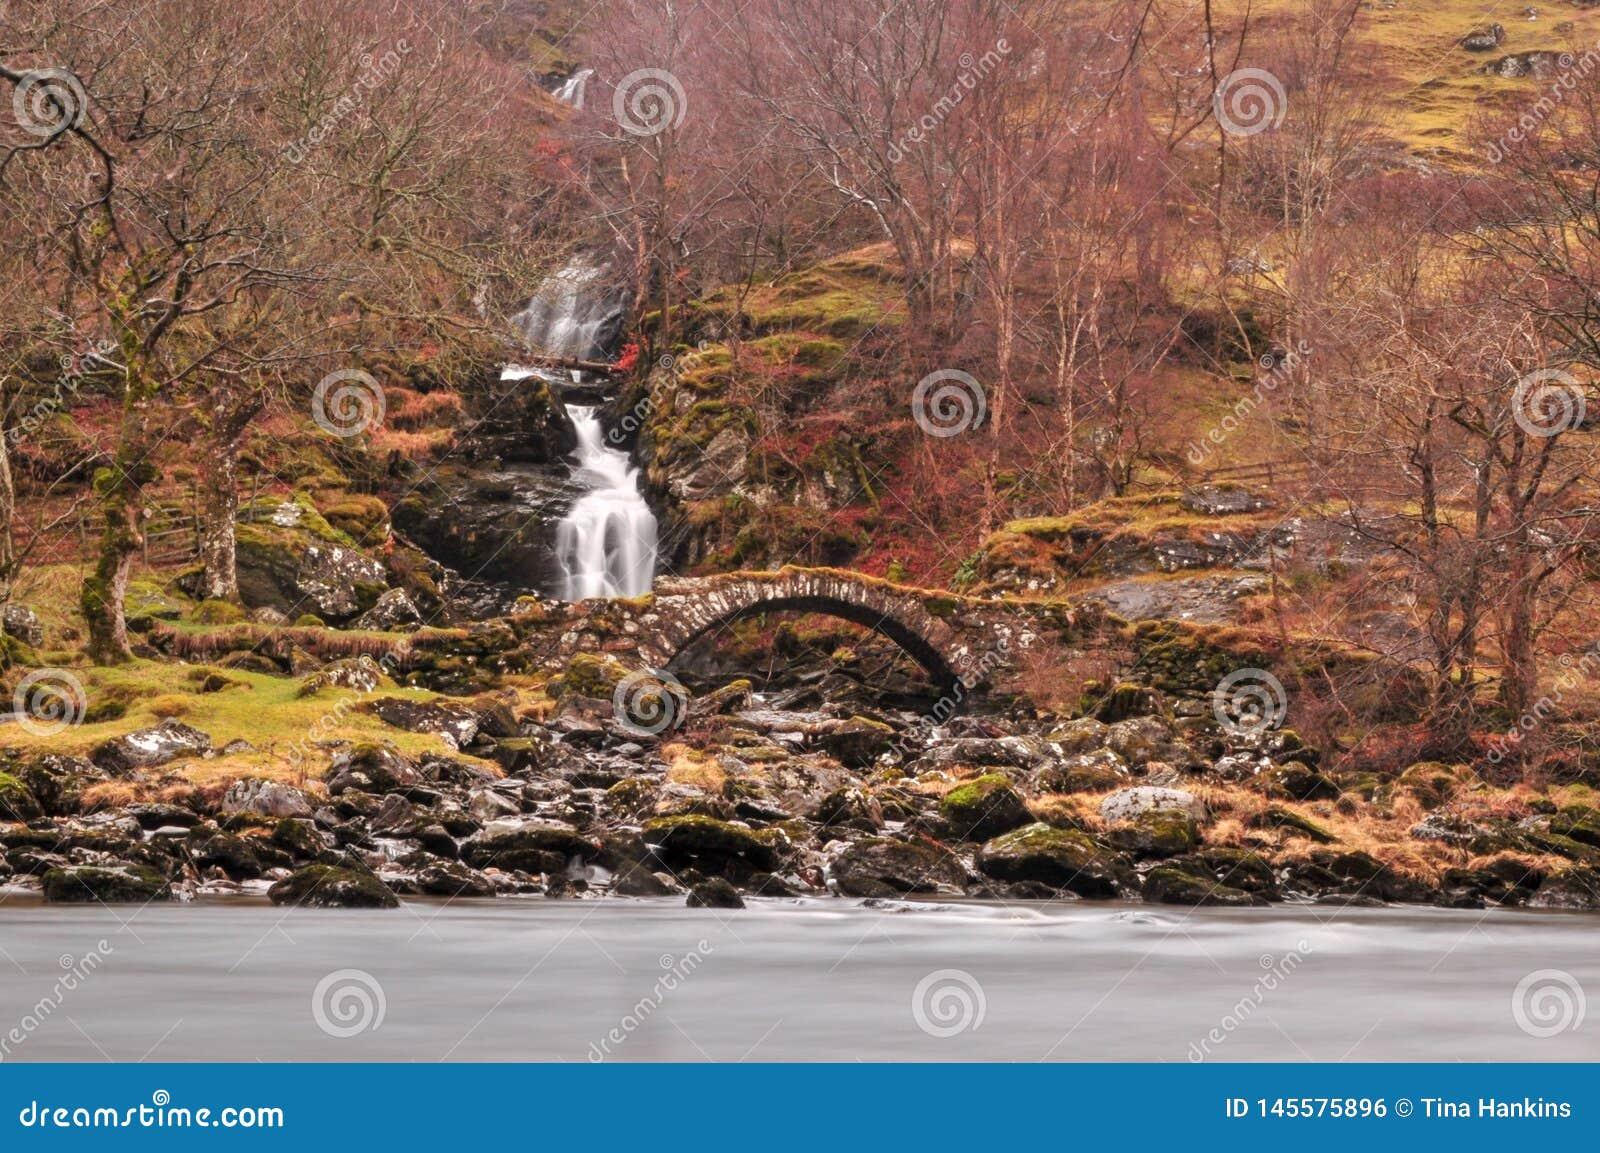 Vieille passerelle romaine avec une cascade grande cascadant derri?re